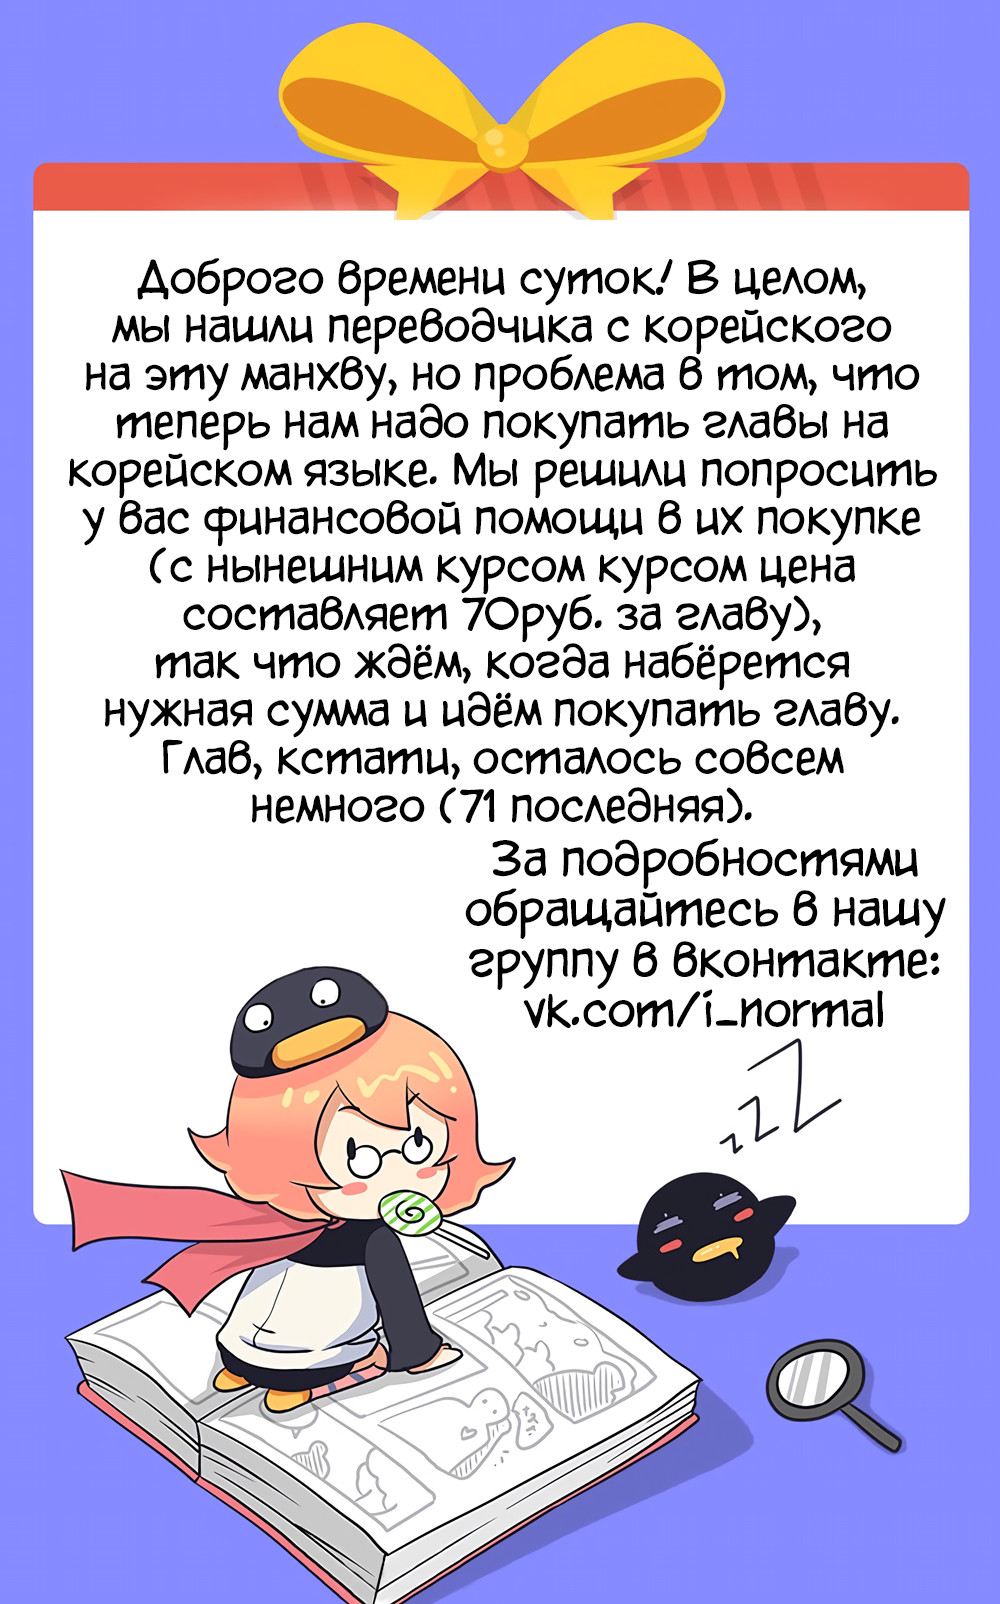 https://r1.ninemanga.com/comics/pic3/48/28784/1277179/1542357141280.jpg Page 5